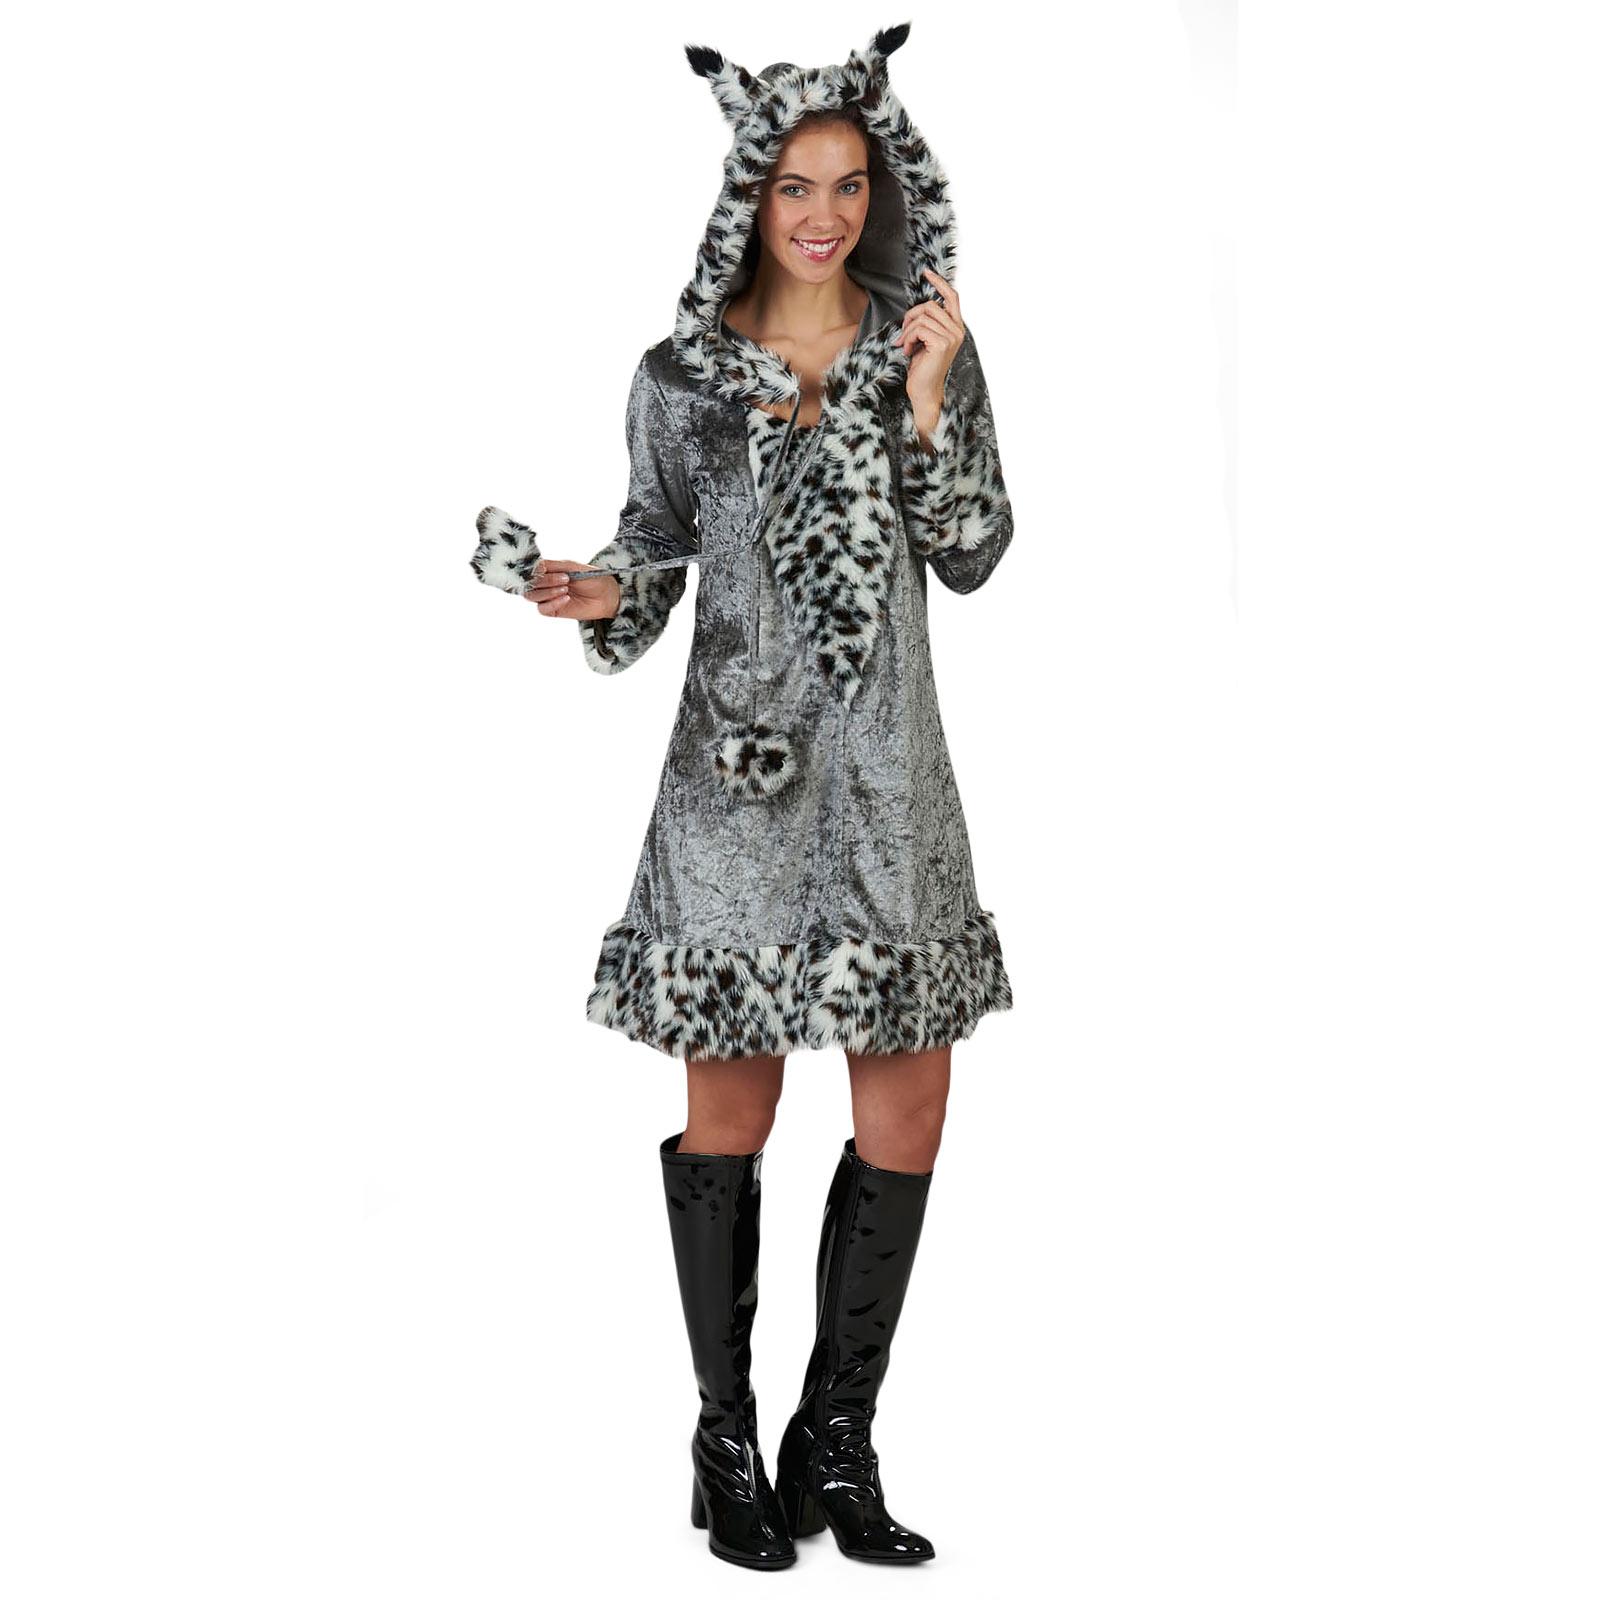 Luchs - Plüsch Kostüm Damen